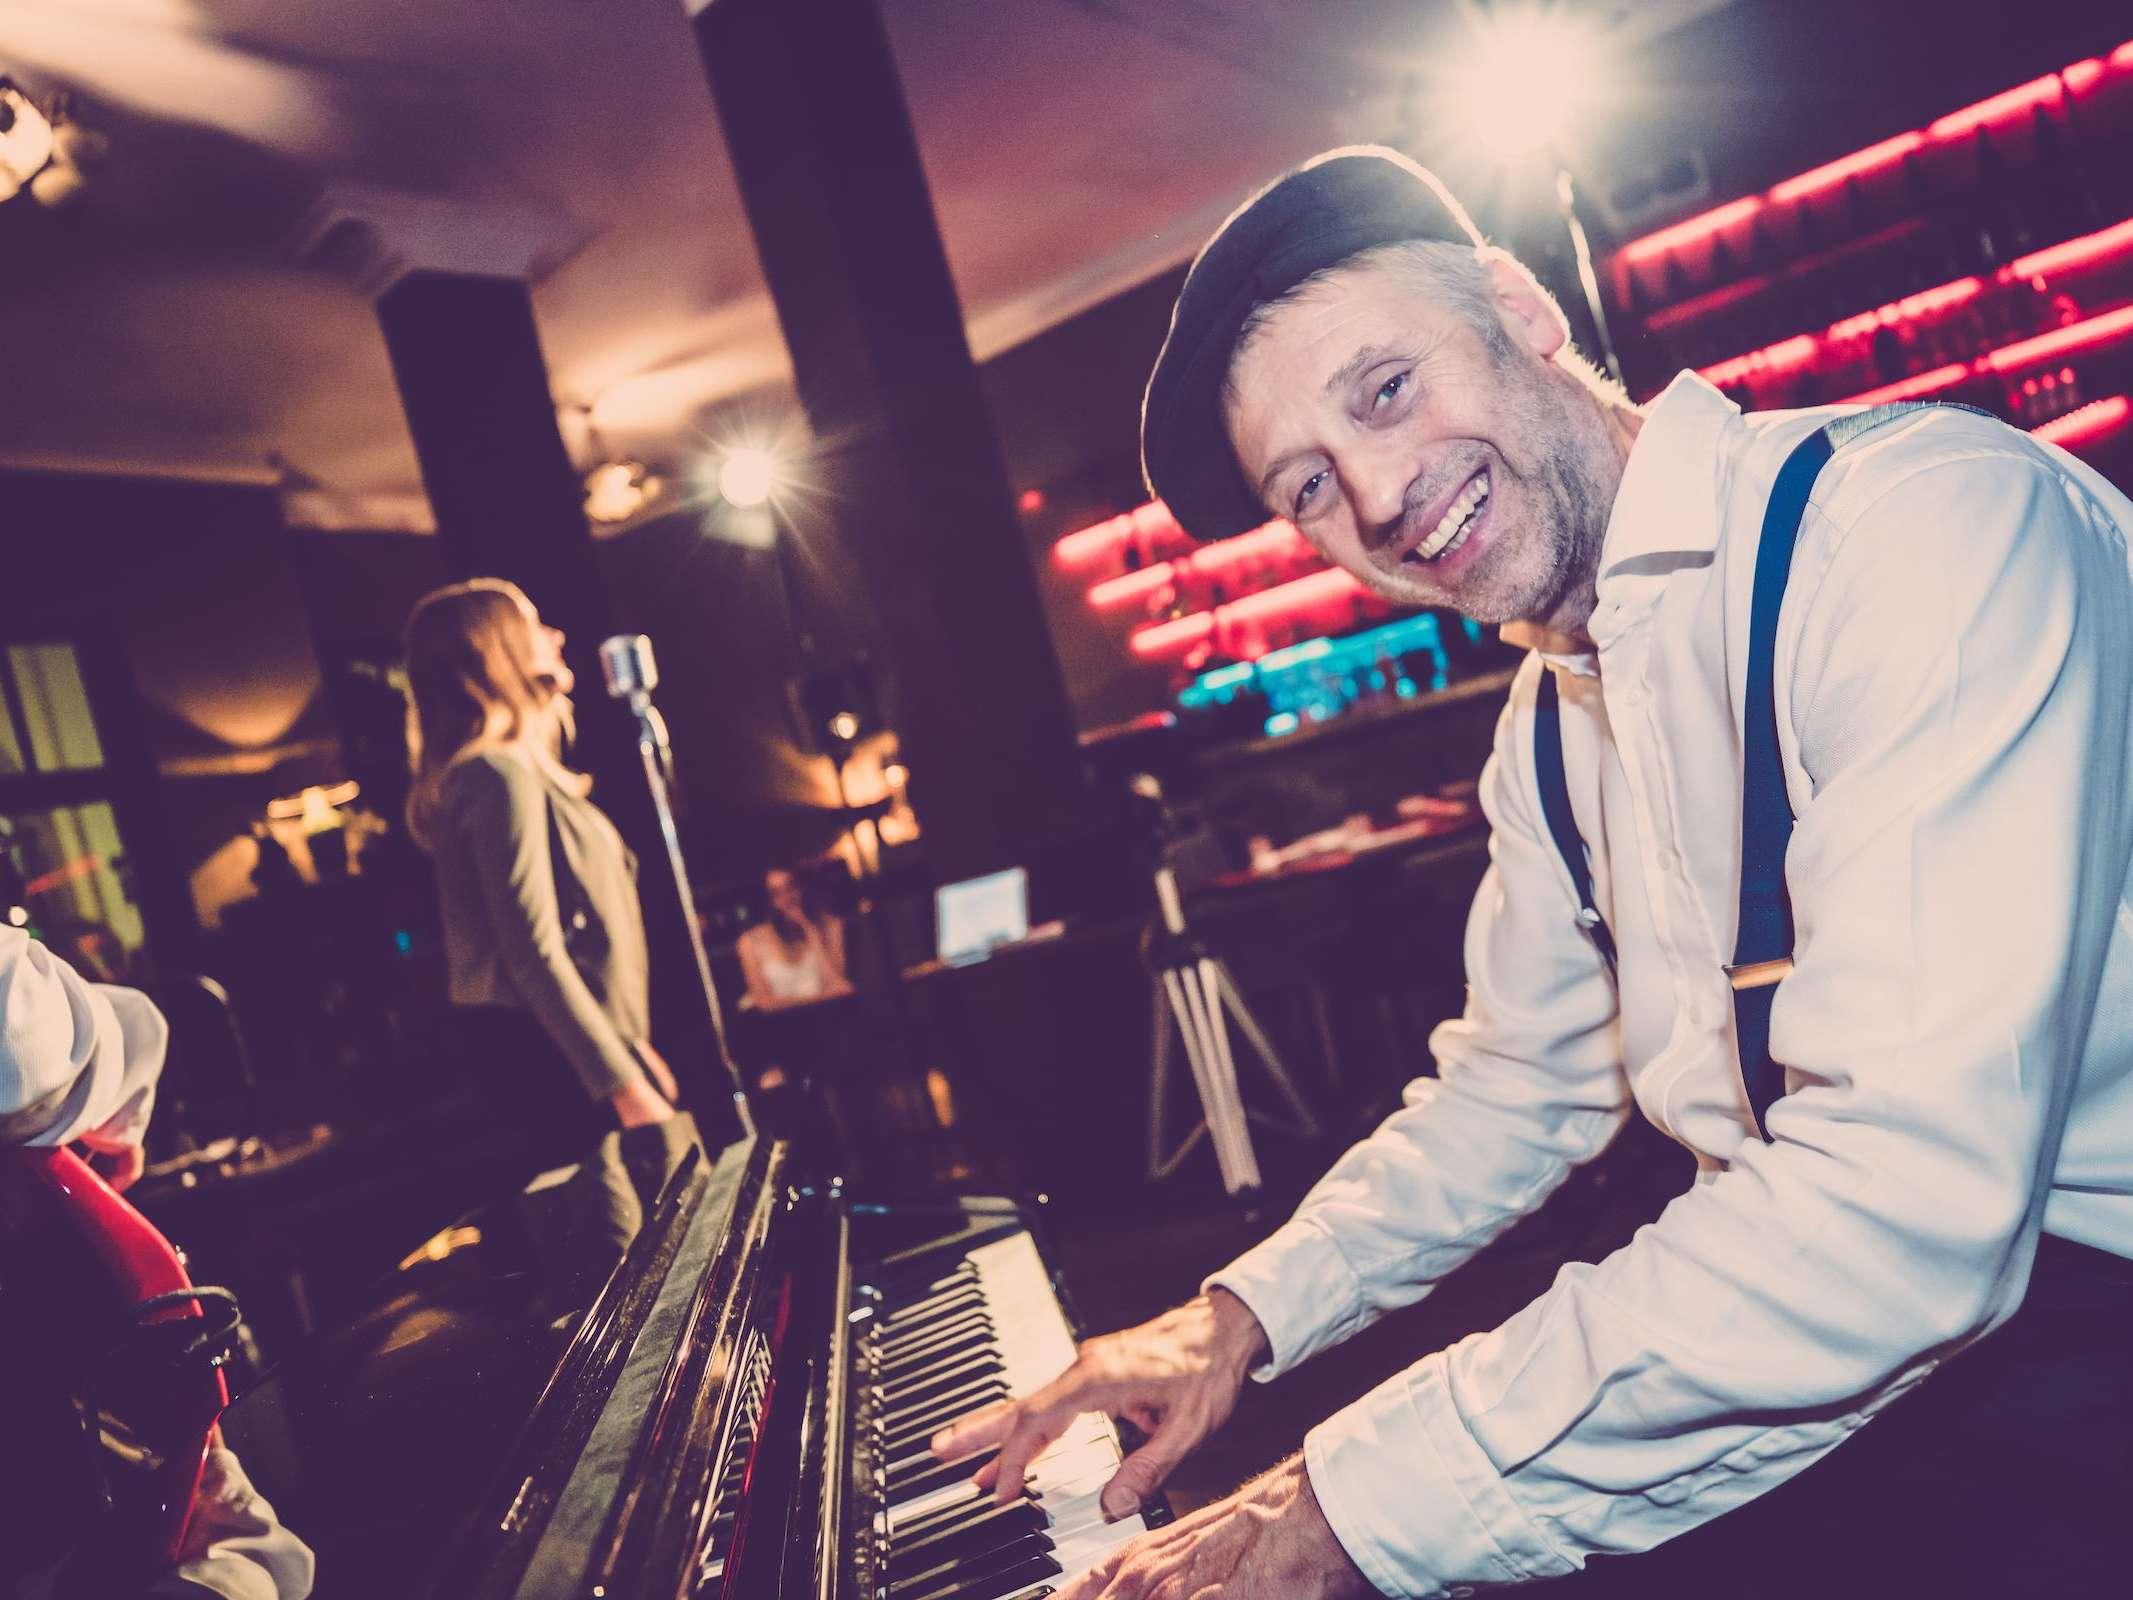 Band | Hannover | Liveband | Livemusik | Partyband | Jazzband | Swingband | Popband | Jazz | Motown | Soul | Pianist | Klavierspieler | Hochzeit | Messe | Firmenfeier | Charity | Gala | Buchen | Mieten | Anfragen |Modern-Jukes